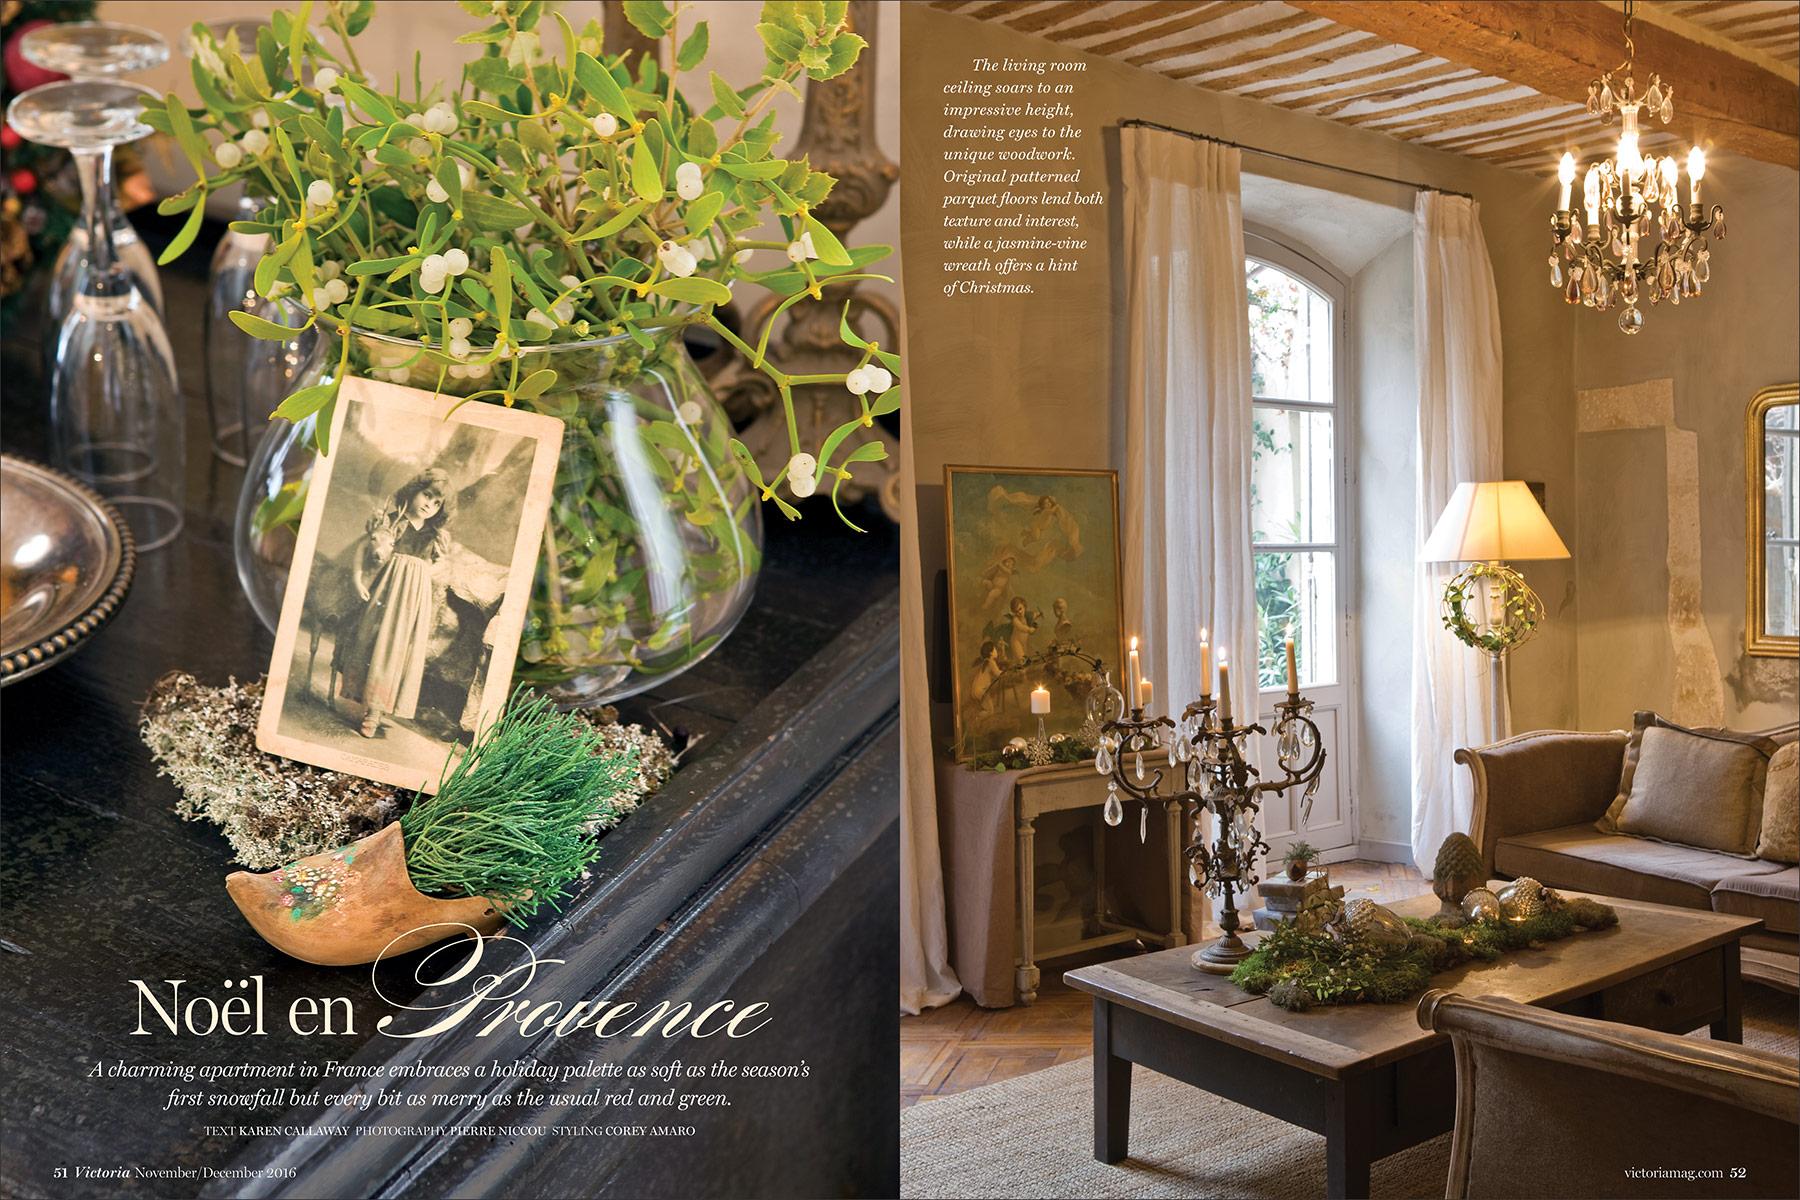 Pierres Et Tradition Apt november/december 2016: holiday issue - victoria magazine